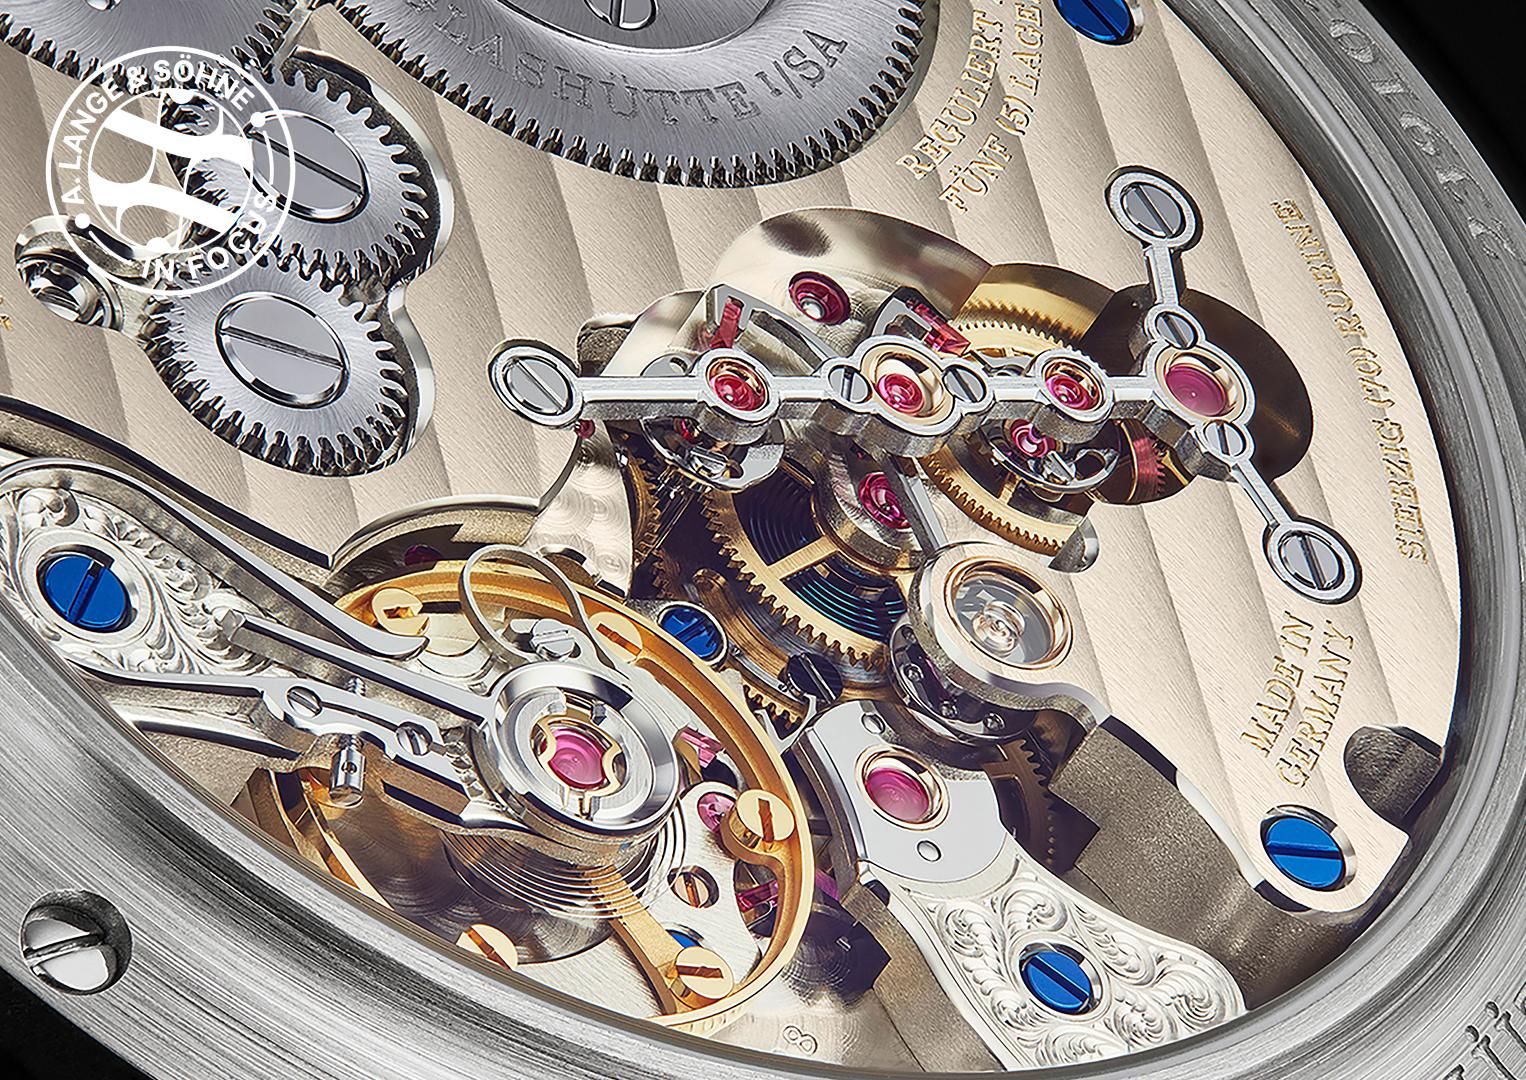 The Zeitwerk's calibre required the development of an innovative new mechanism